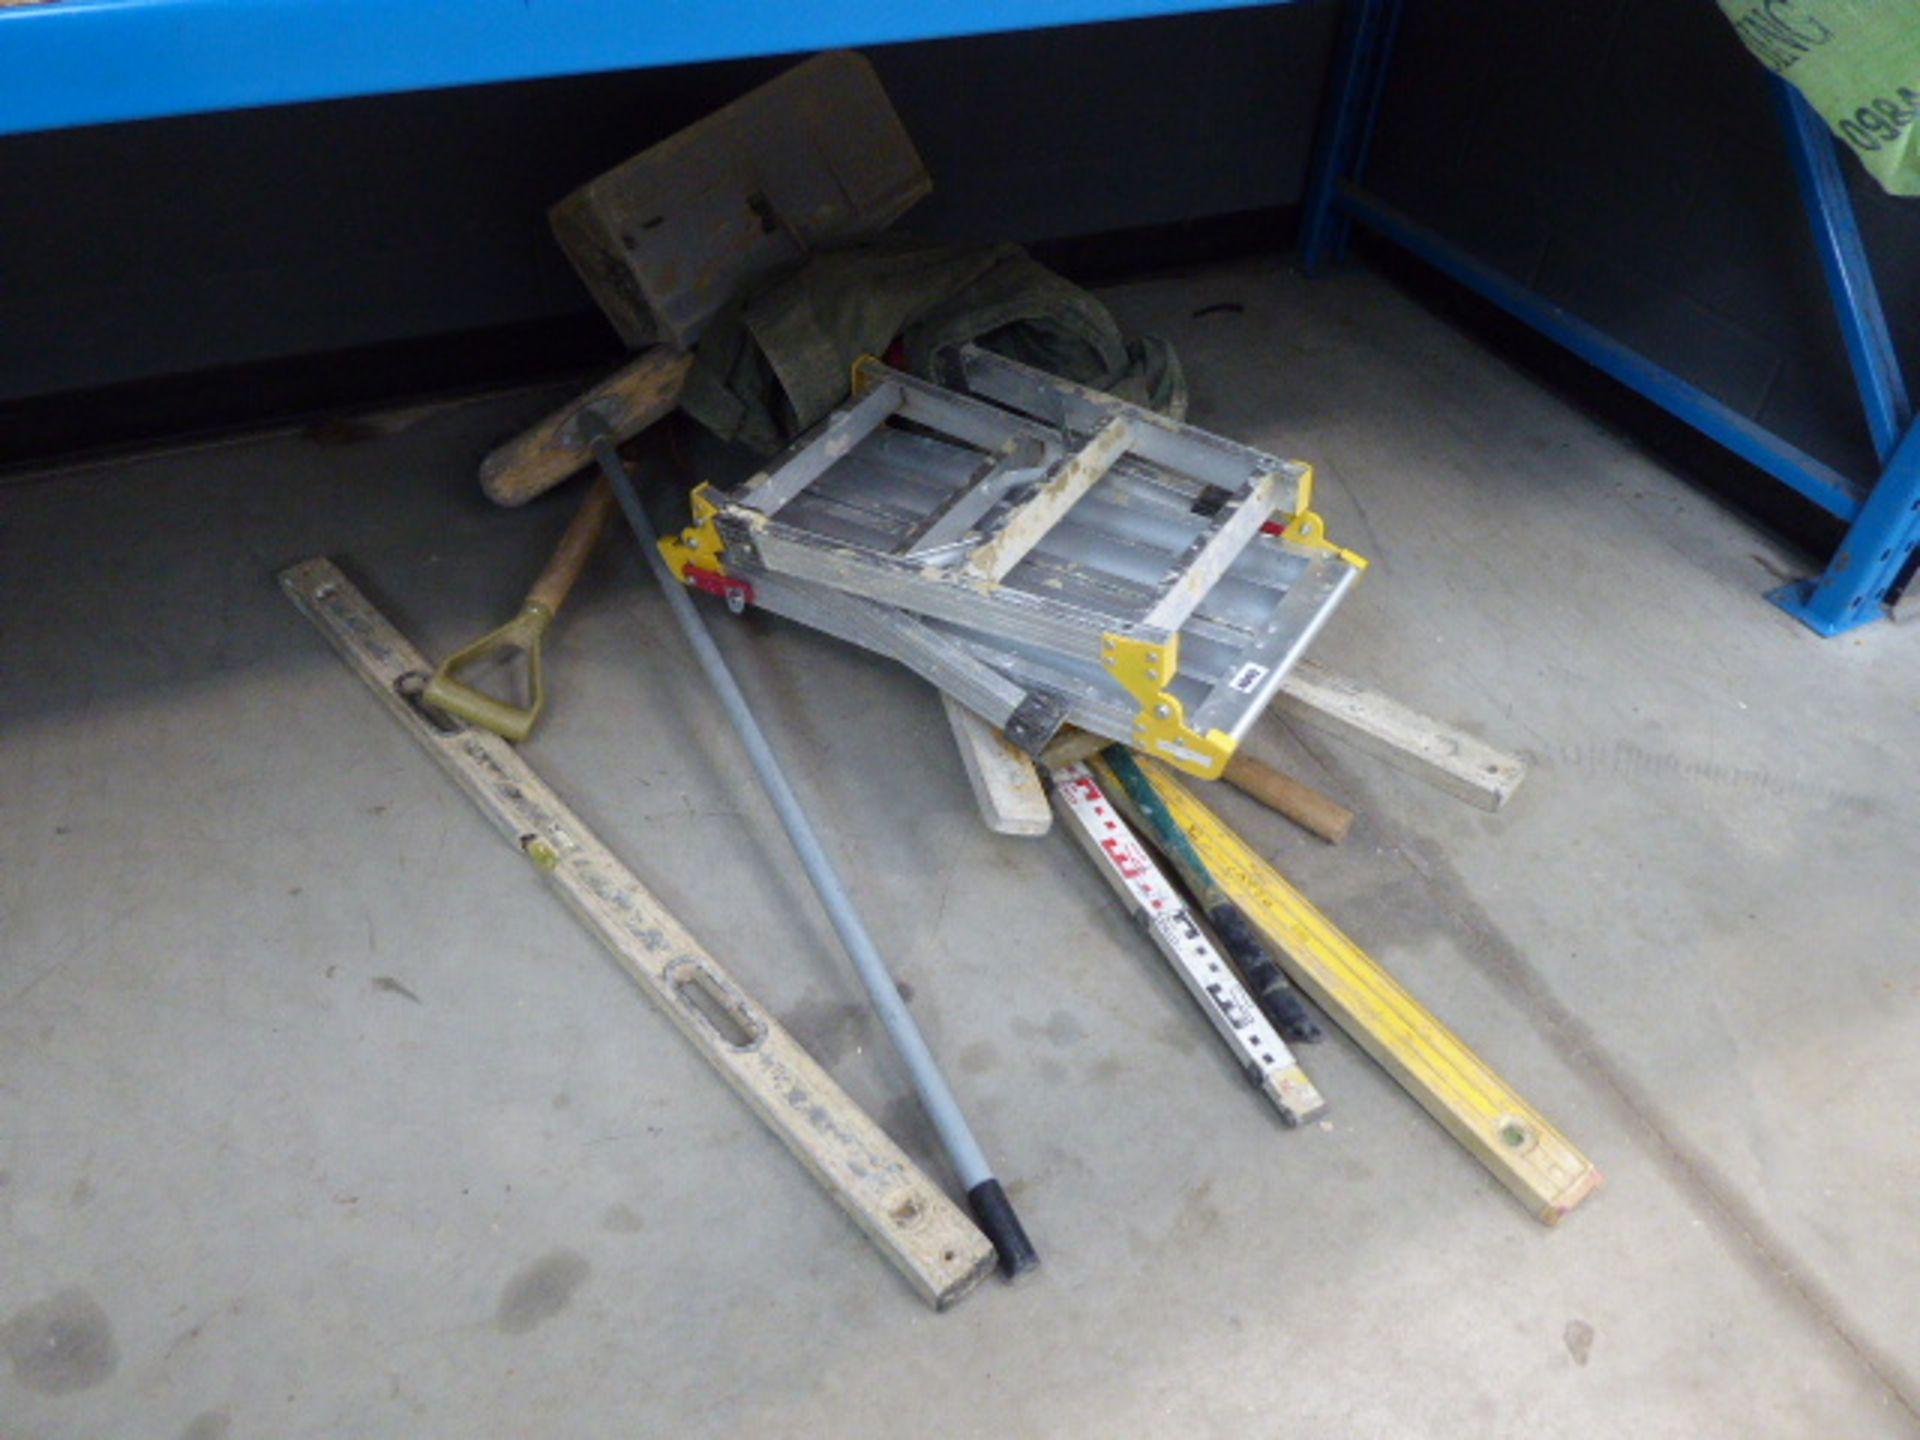 Lot 4049 - Small quantity of tools and hop up platform